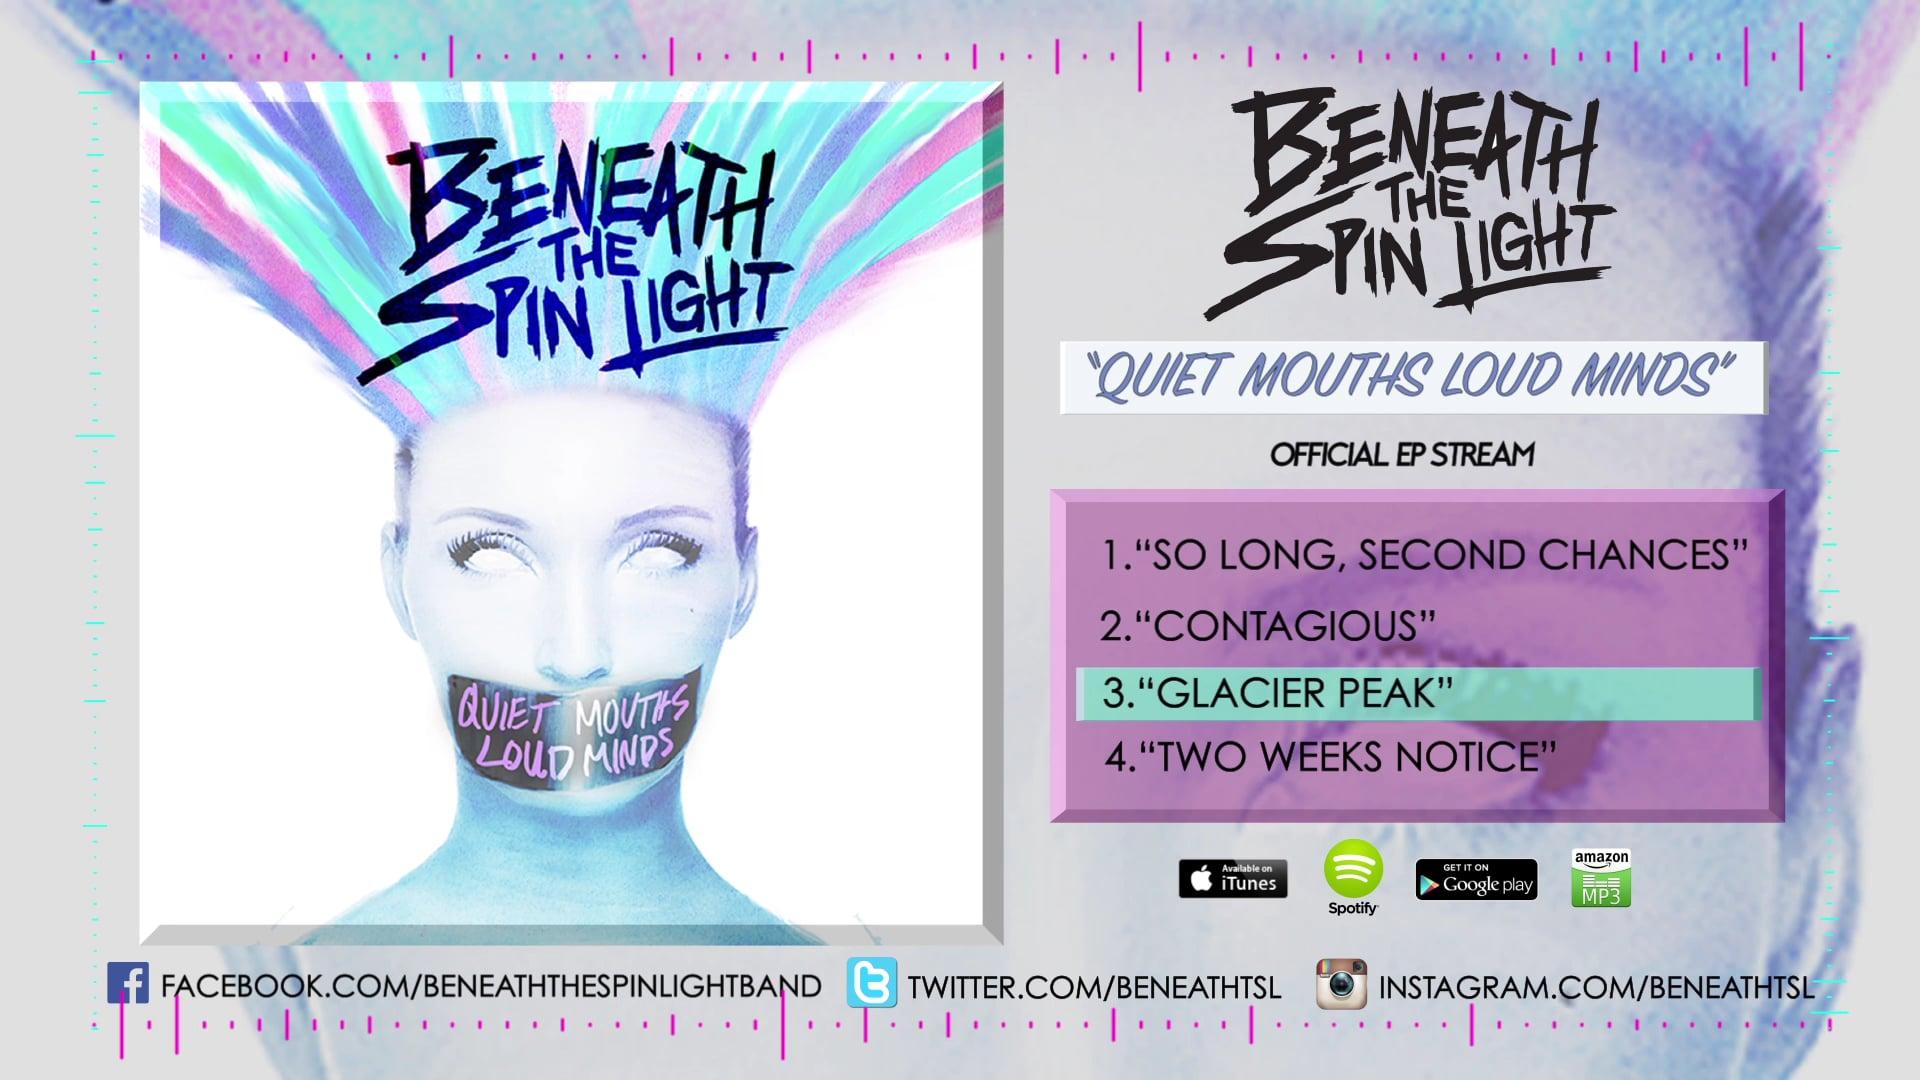 Beneath The Spin Light EP Stream (FINAL CUT)